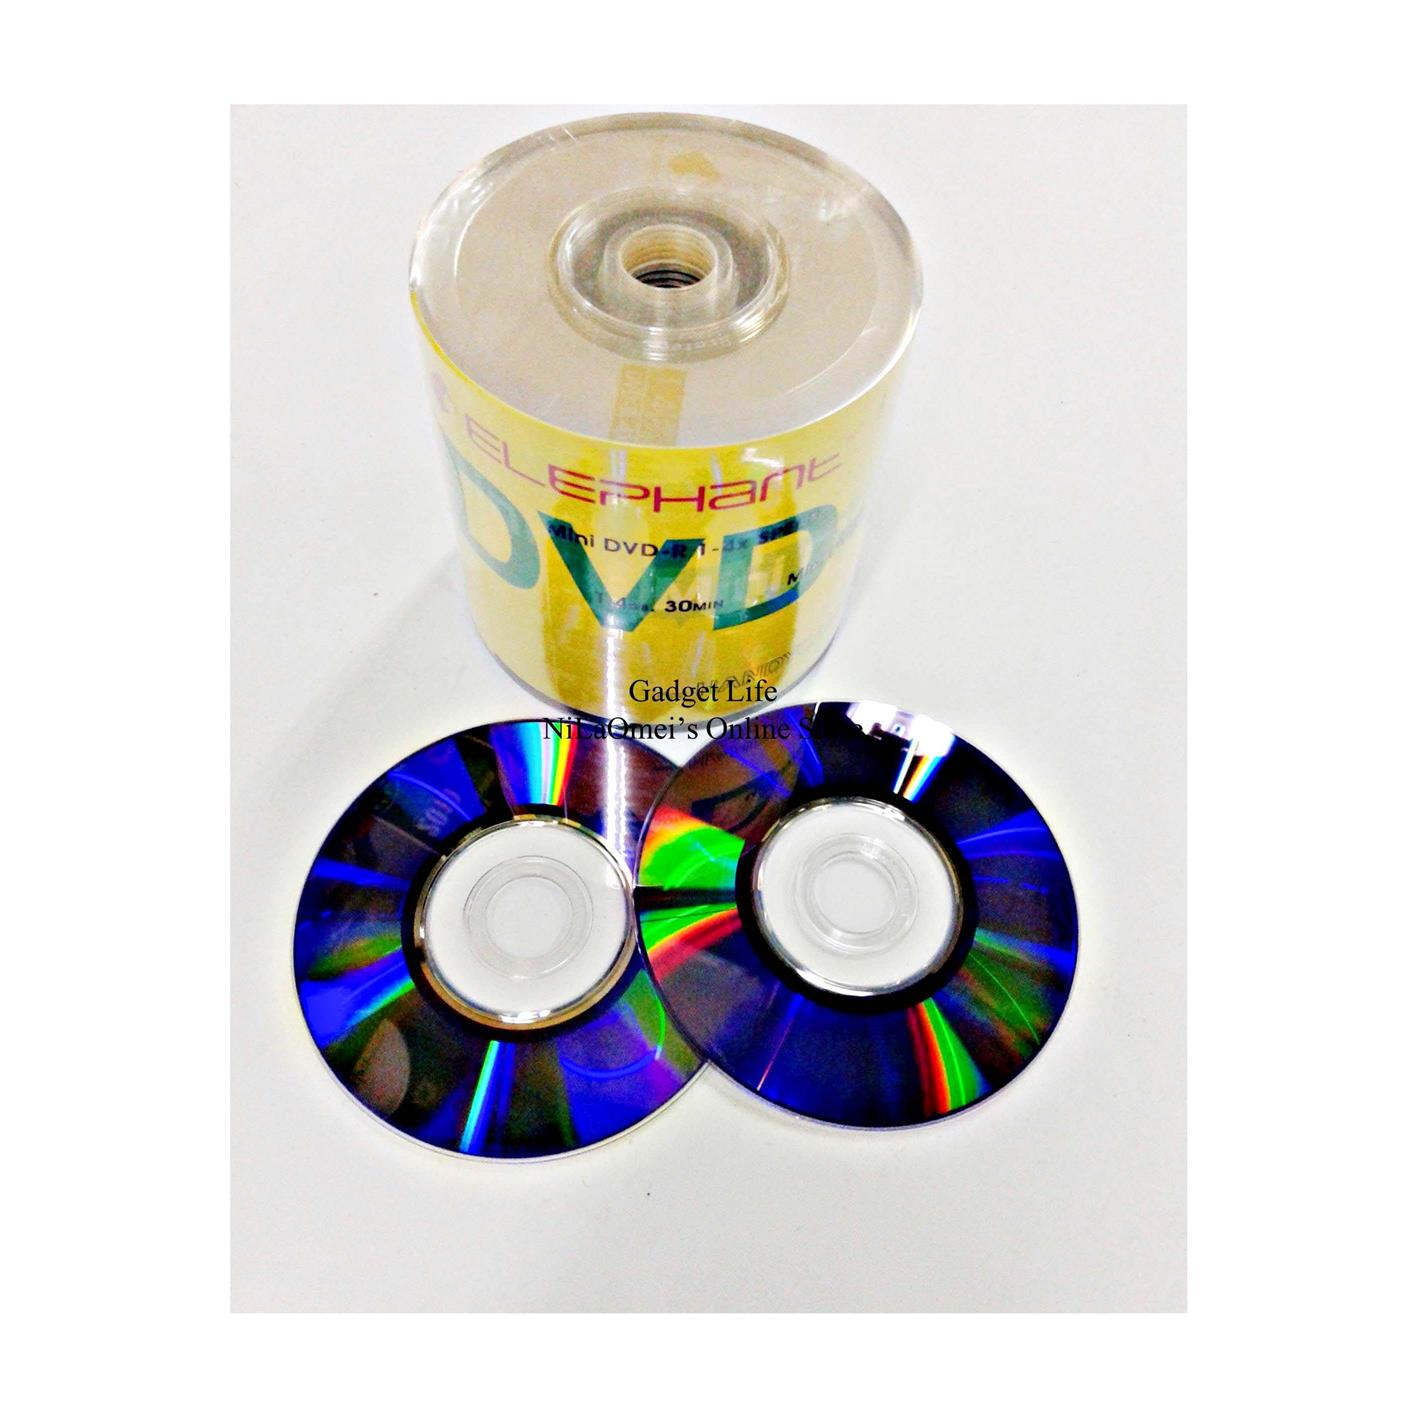 Mini Size DVD-R / PP Sleeve Envelope / Storage Case (100pcs)  sc 1 st  Lelong.my & Mini Size DVD-R / PP Sleeve Envelope (end 3/23/2019 1:15 PM)